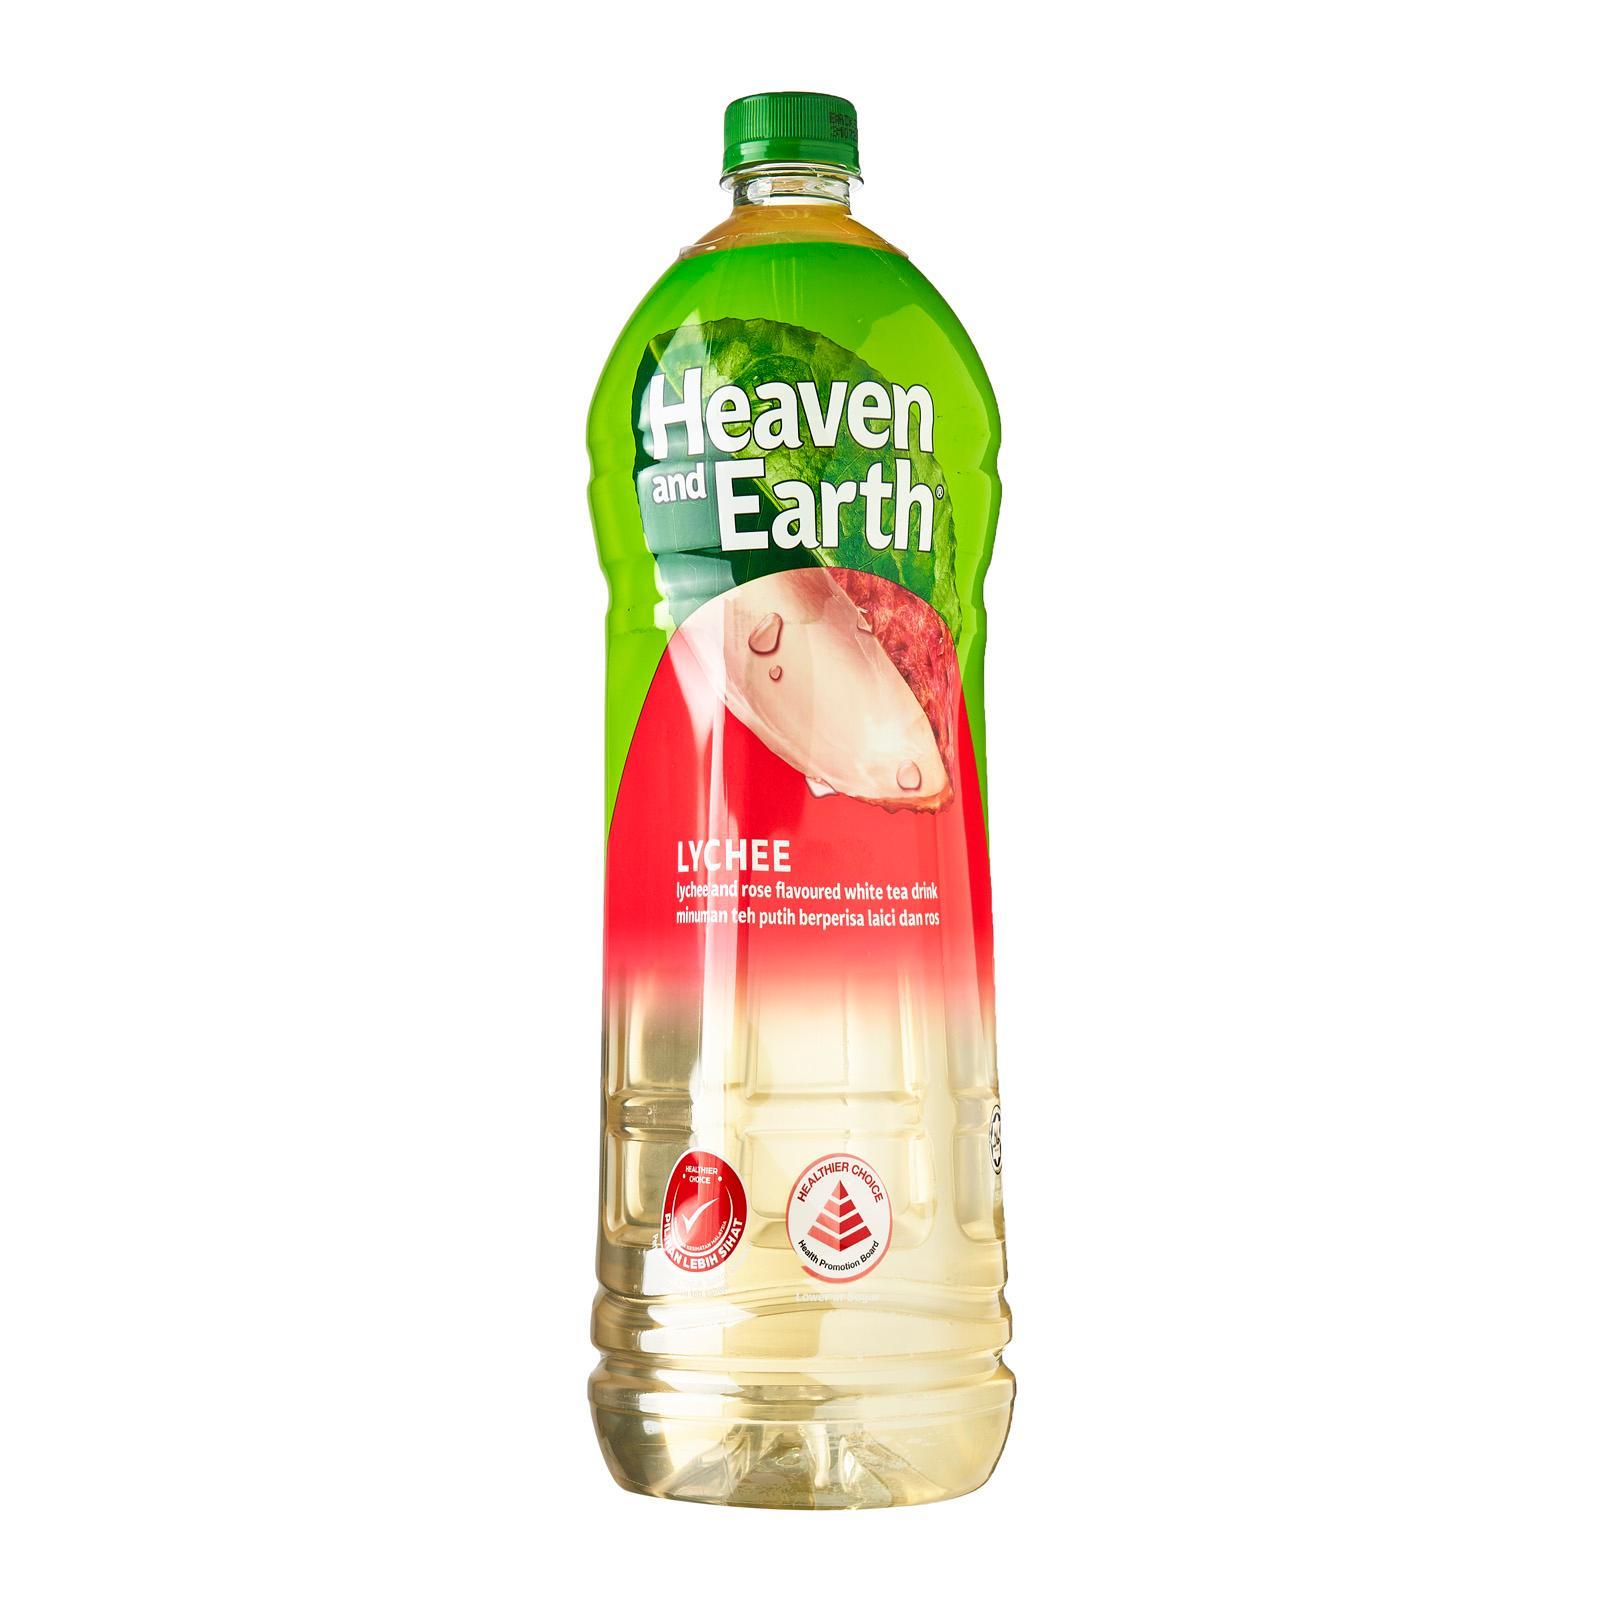 Heaven & Earth Lychee Rose Tea - 1.5L